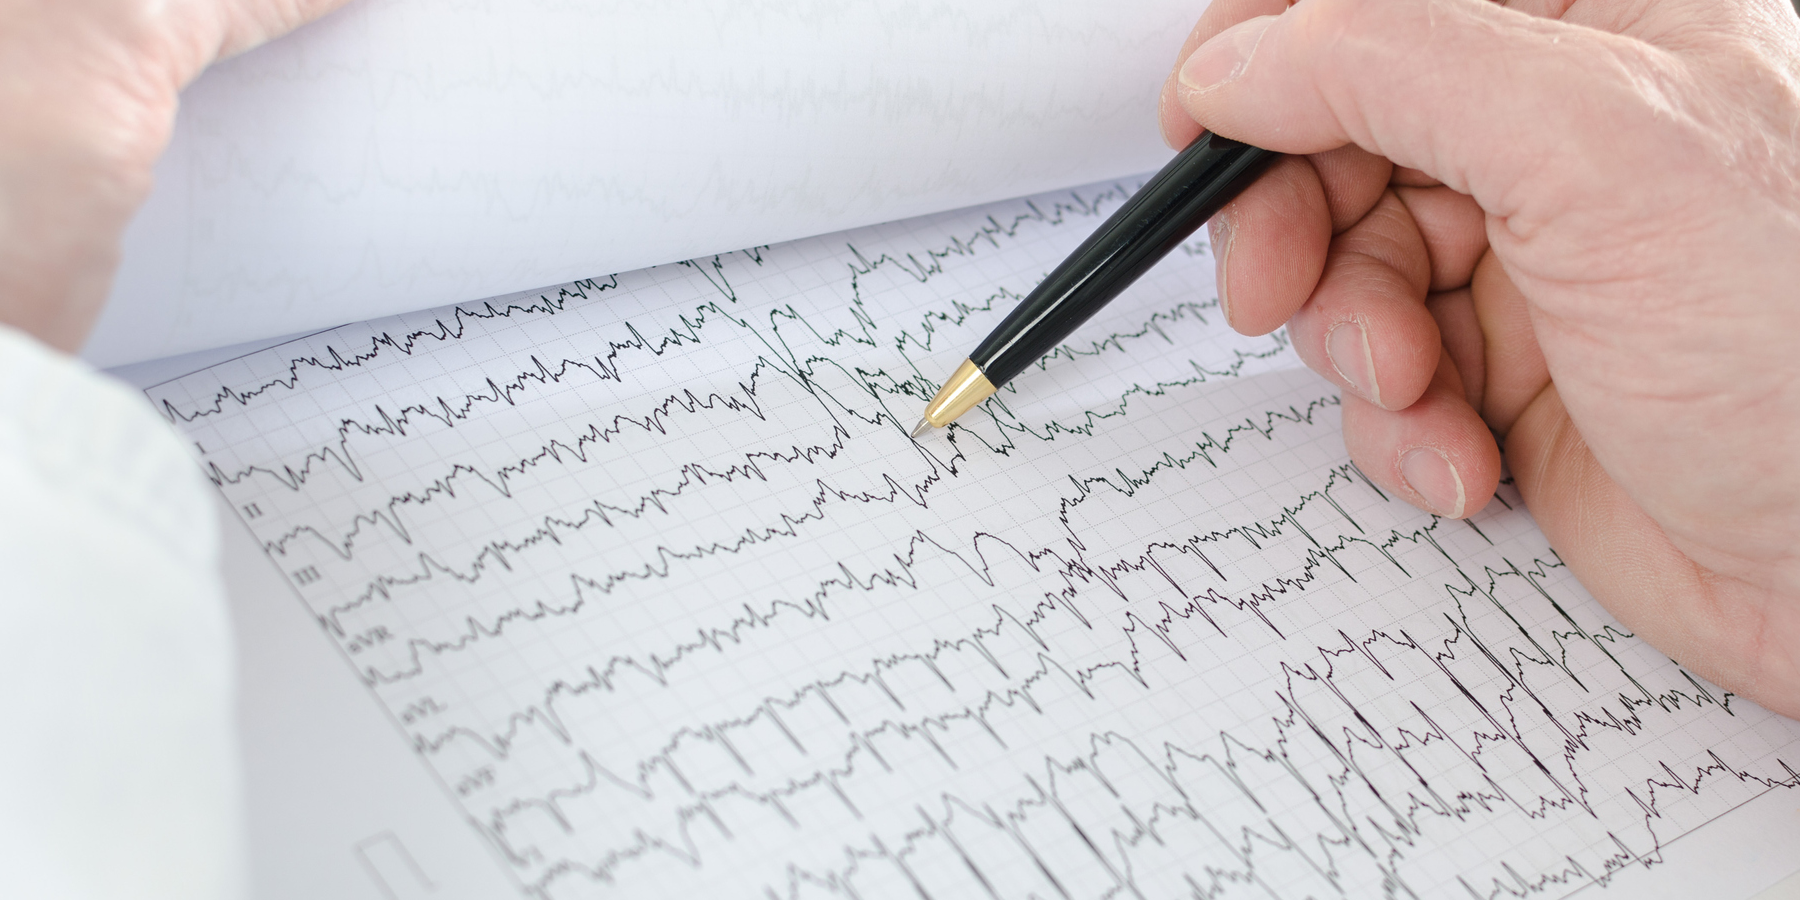 More Than 200 Genetic Factors Cause Heart Arrhythmias